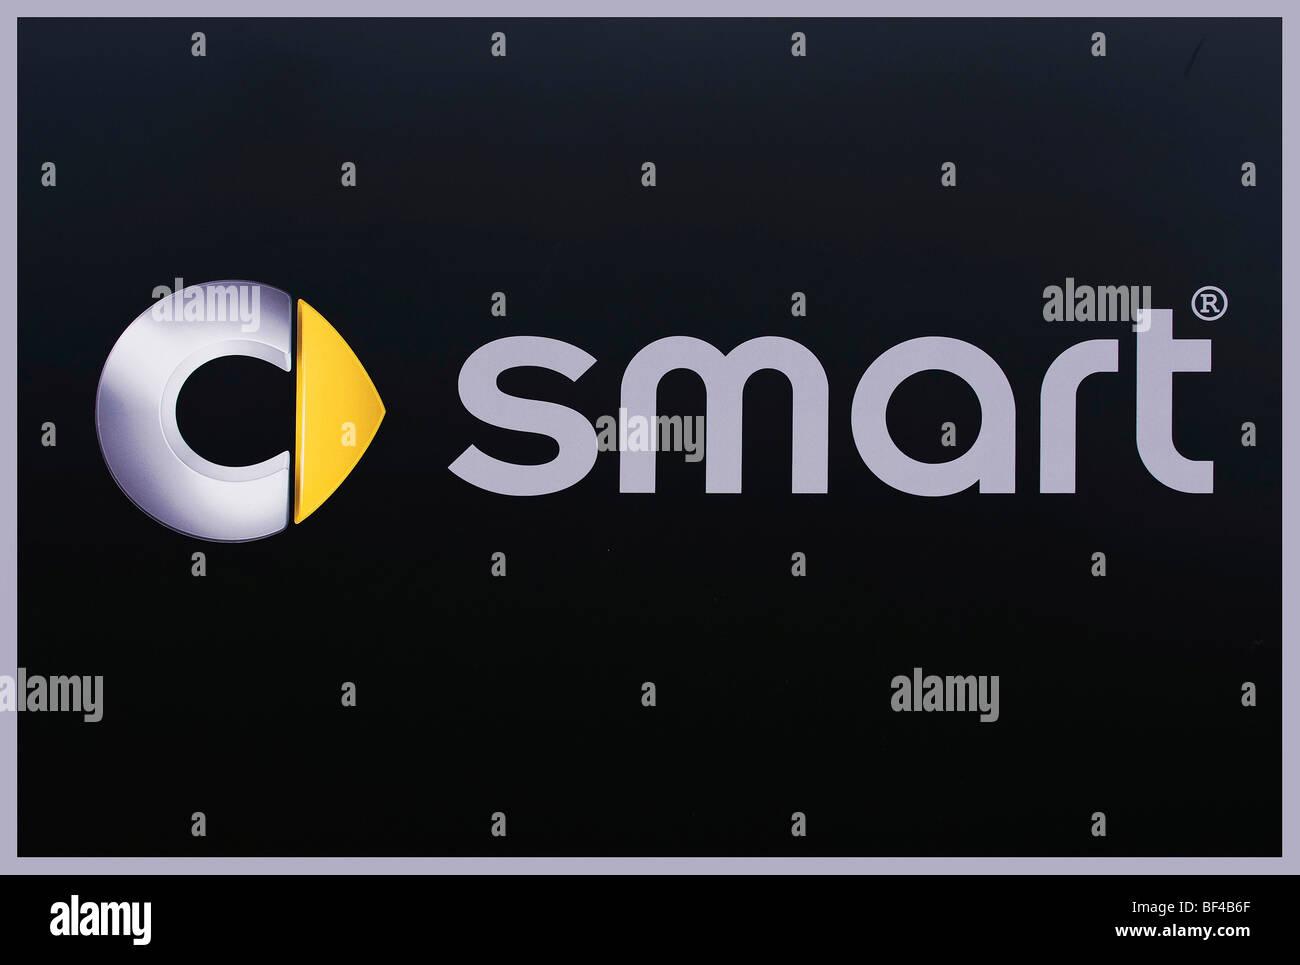 Smart logo for a car brand, Daimler AG - Stock Image